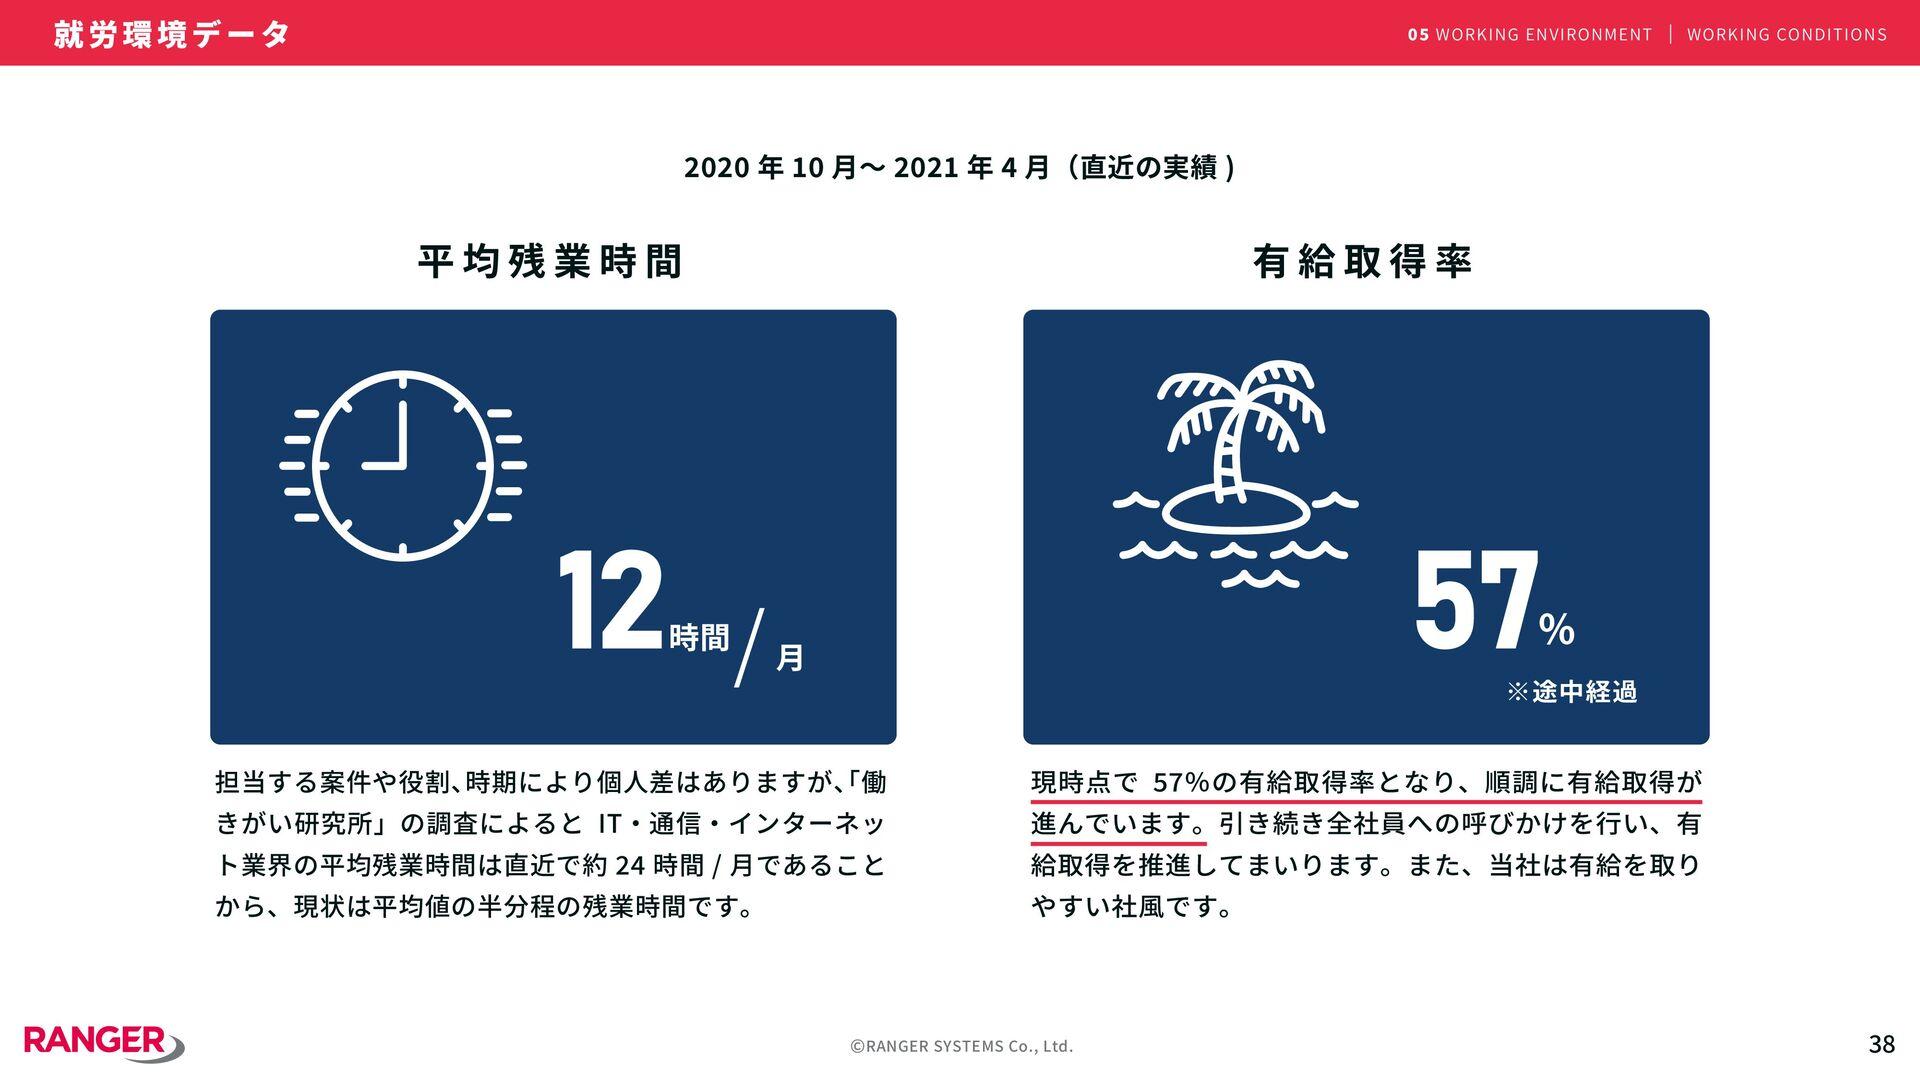 ©RANGER SYSTEMS Co., Ltd. �� ● 勤務体系  - フレックス制 (...